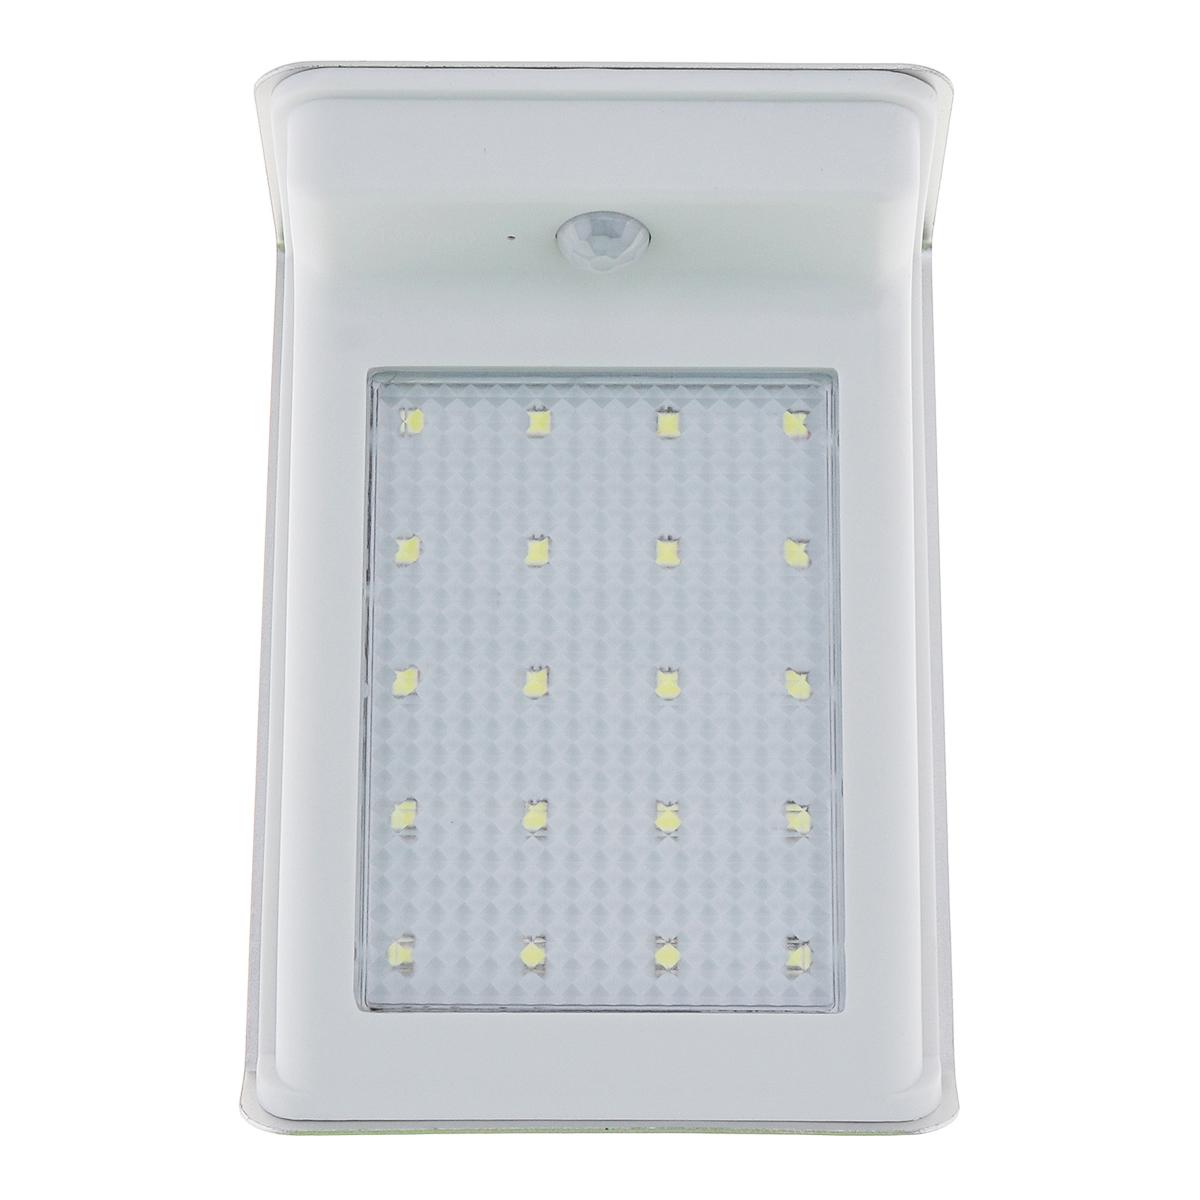 Waterproof 20 LED Solar Power Outdoor Security Light Lamp PIR Motion Sensor